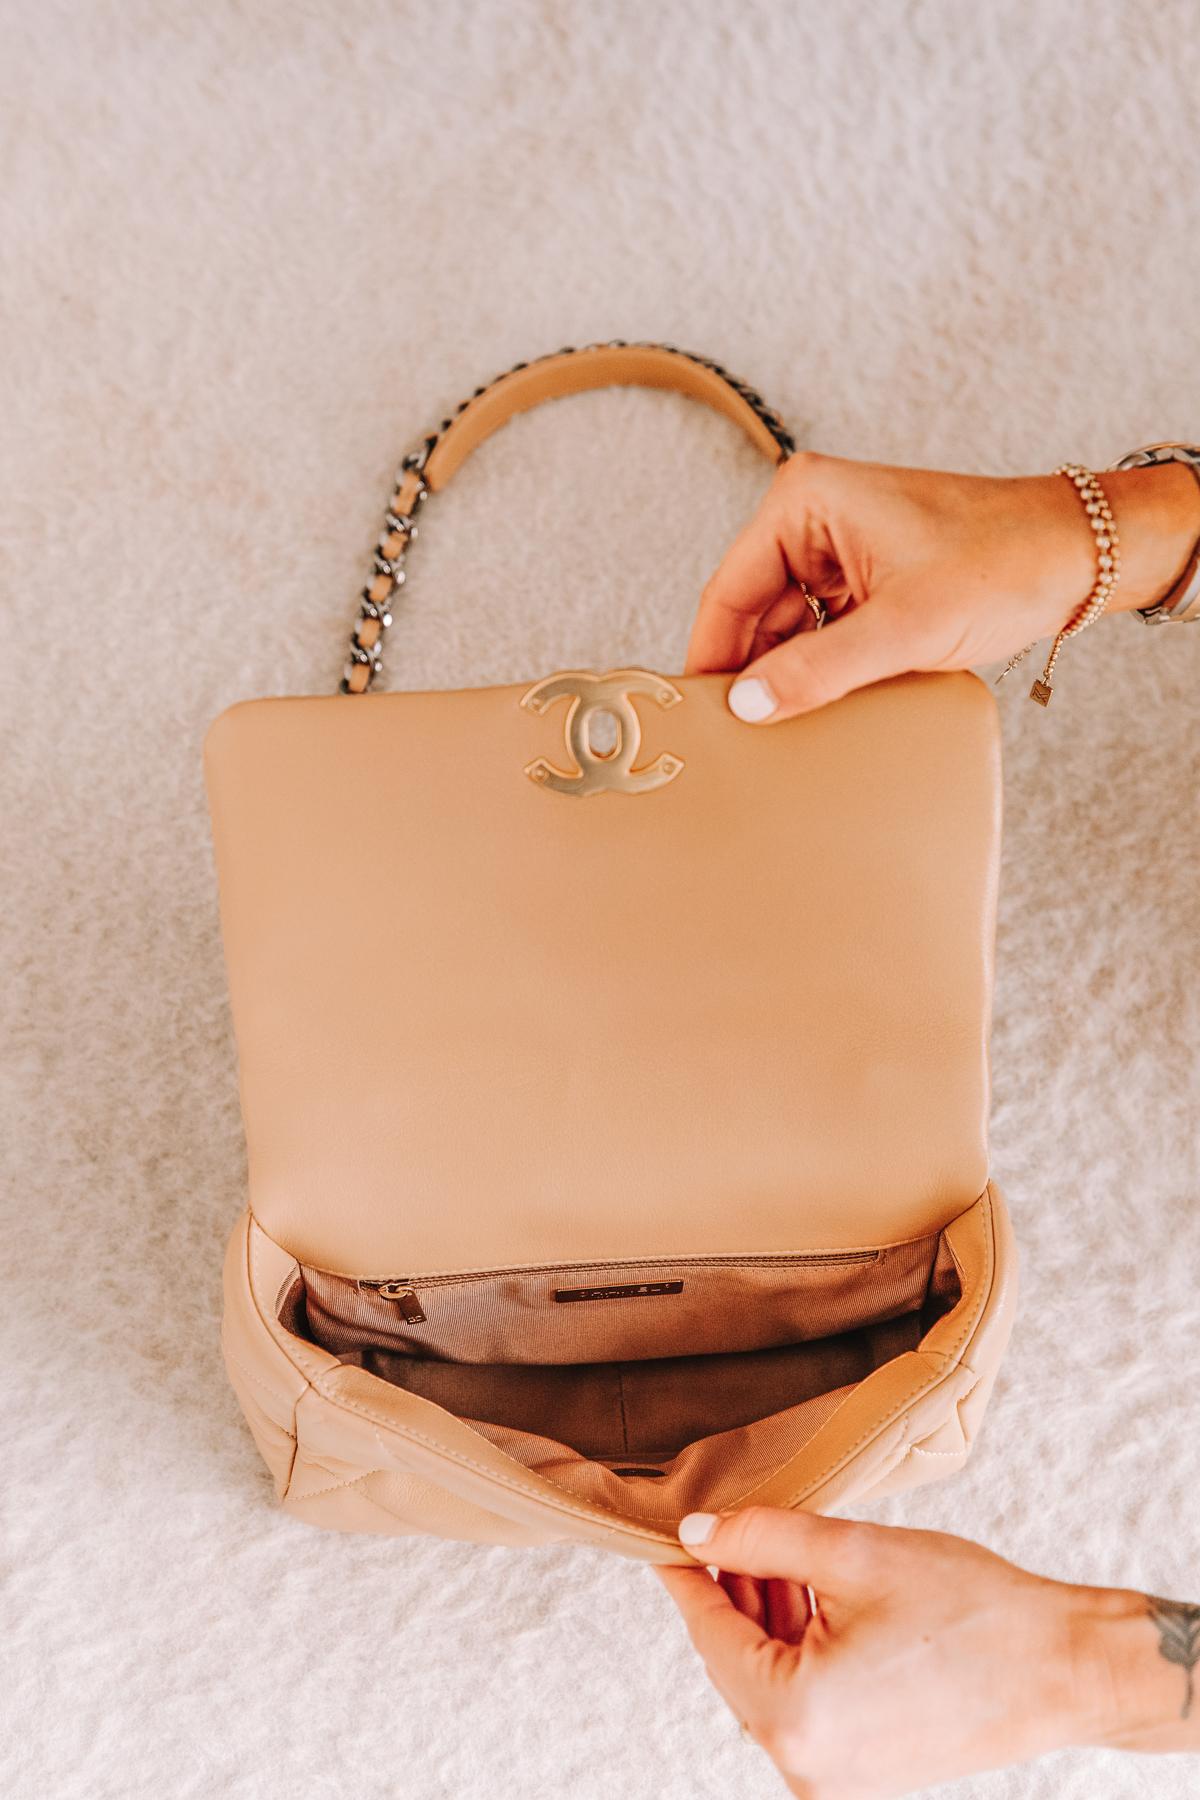 Fashion Jackson Chanel 19 Classic Small Dark Beige Handbag